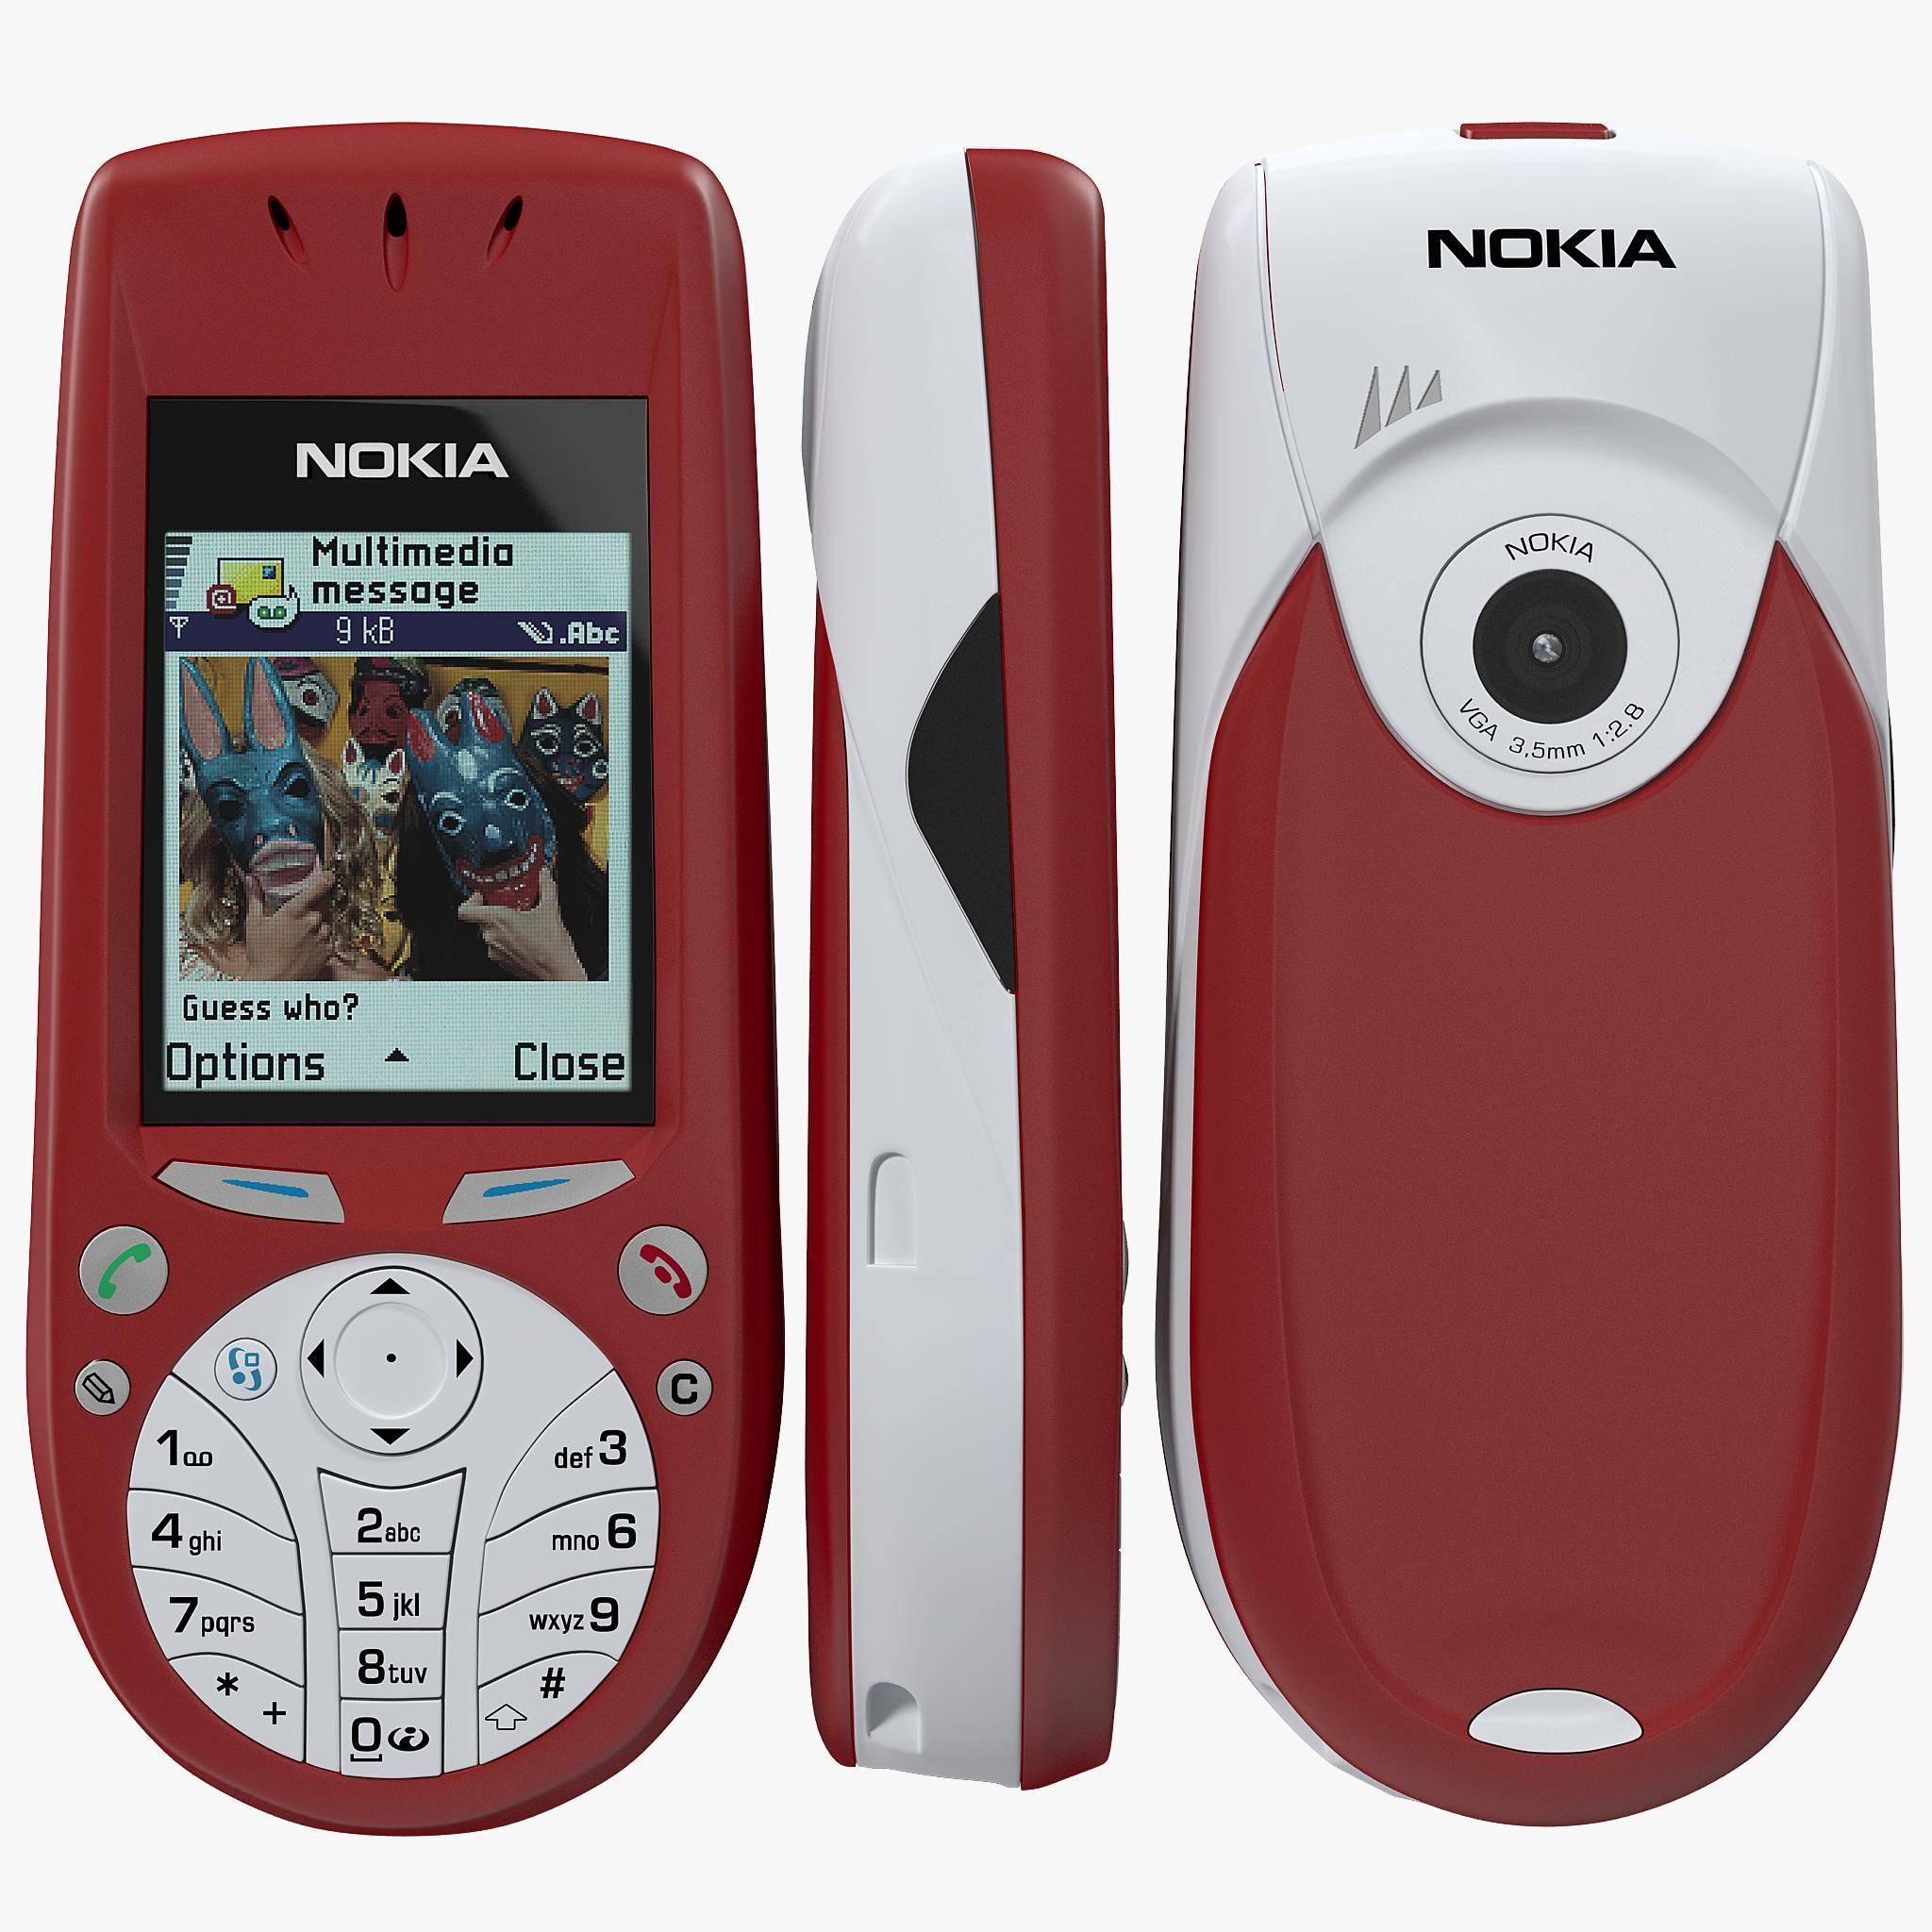 Nokia 3660 3D Model AD ,NokiaModel in 2020 Nokia